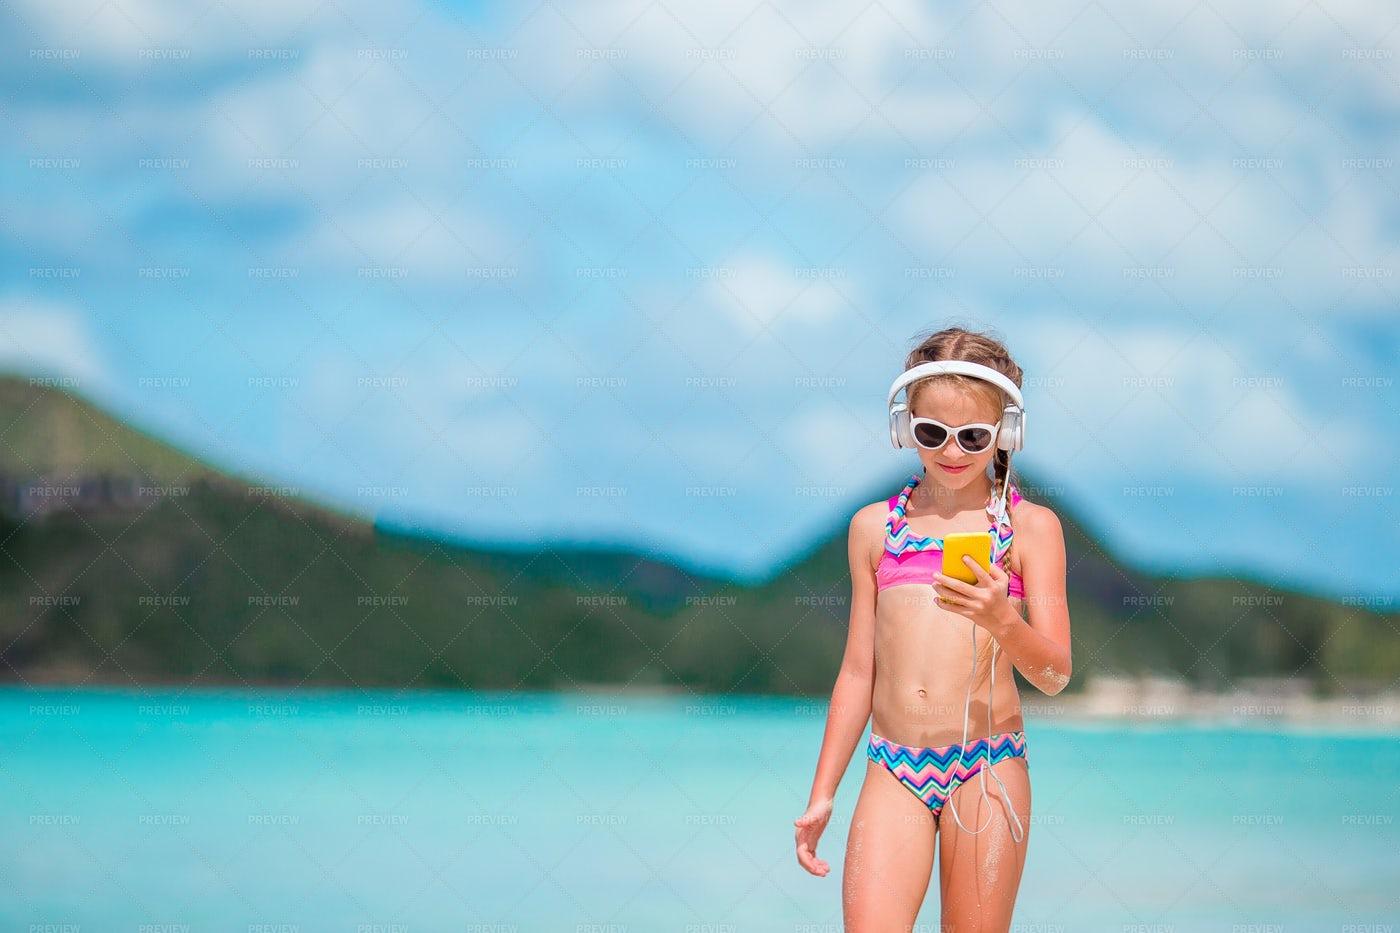 Beach Gadgets: Stock Photos